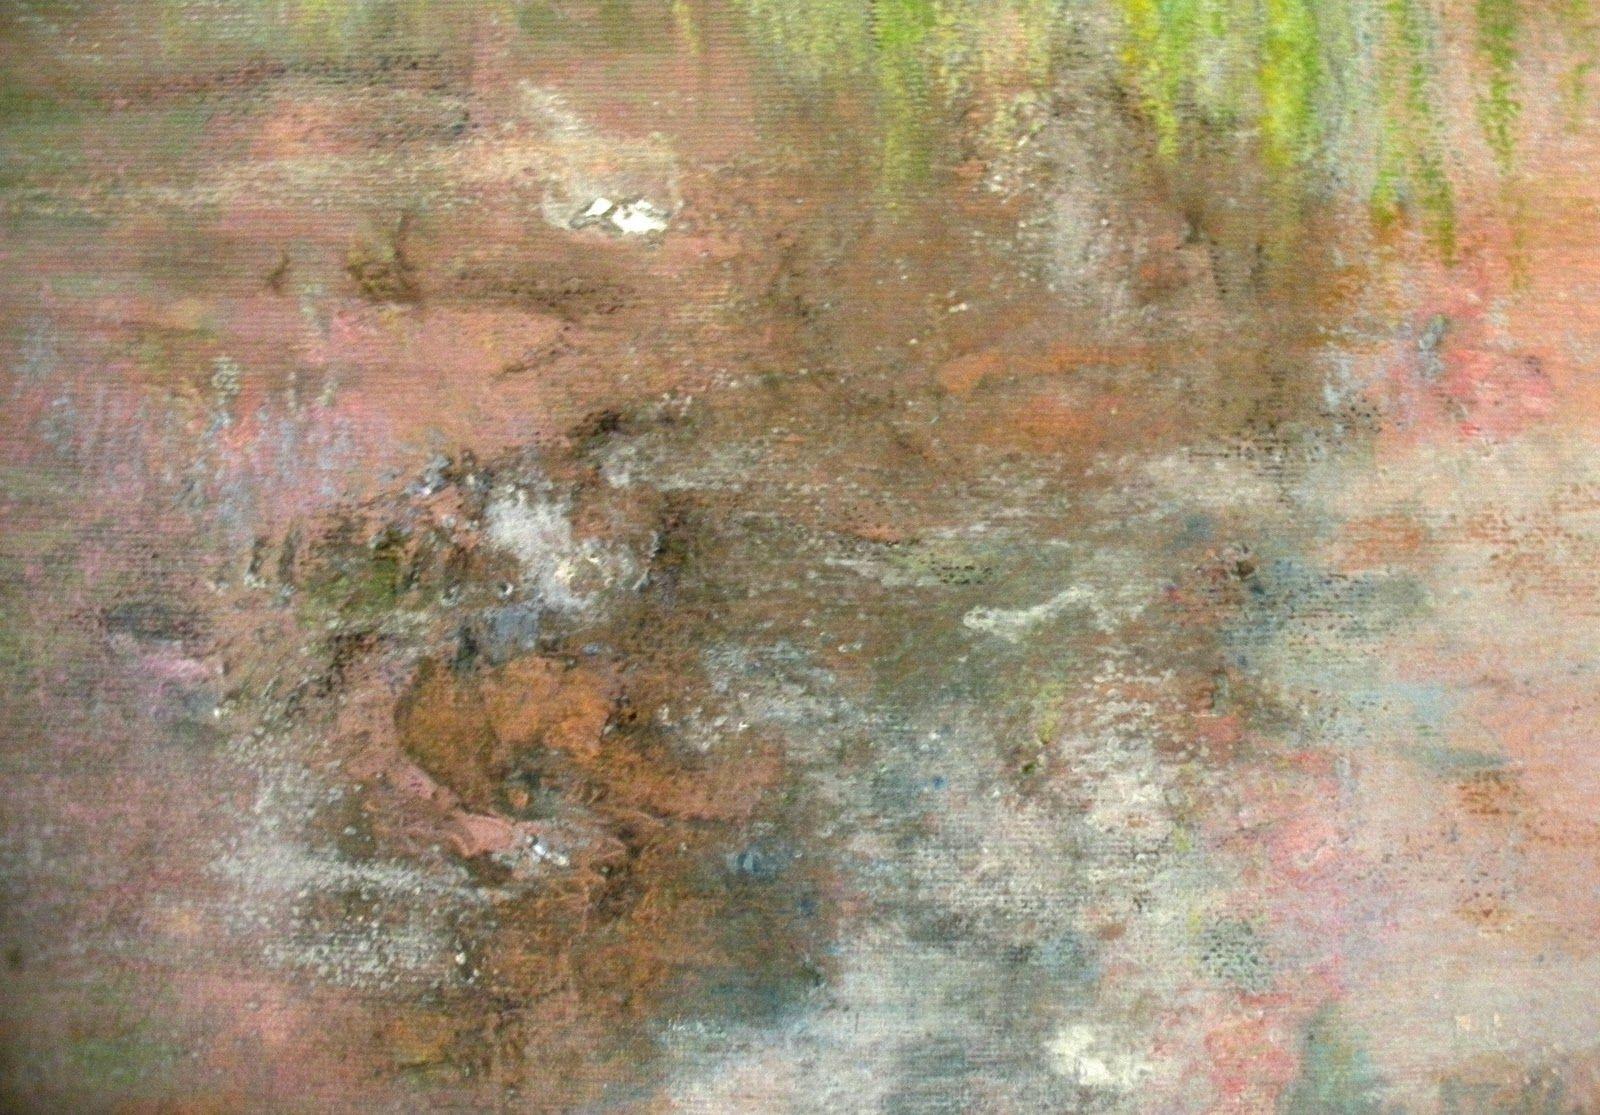 Reflections+8+x+10+oil+pastel.jpg (1600×1115)